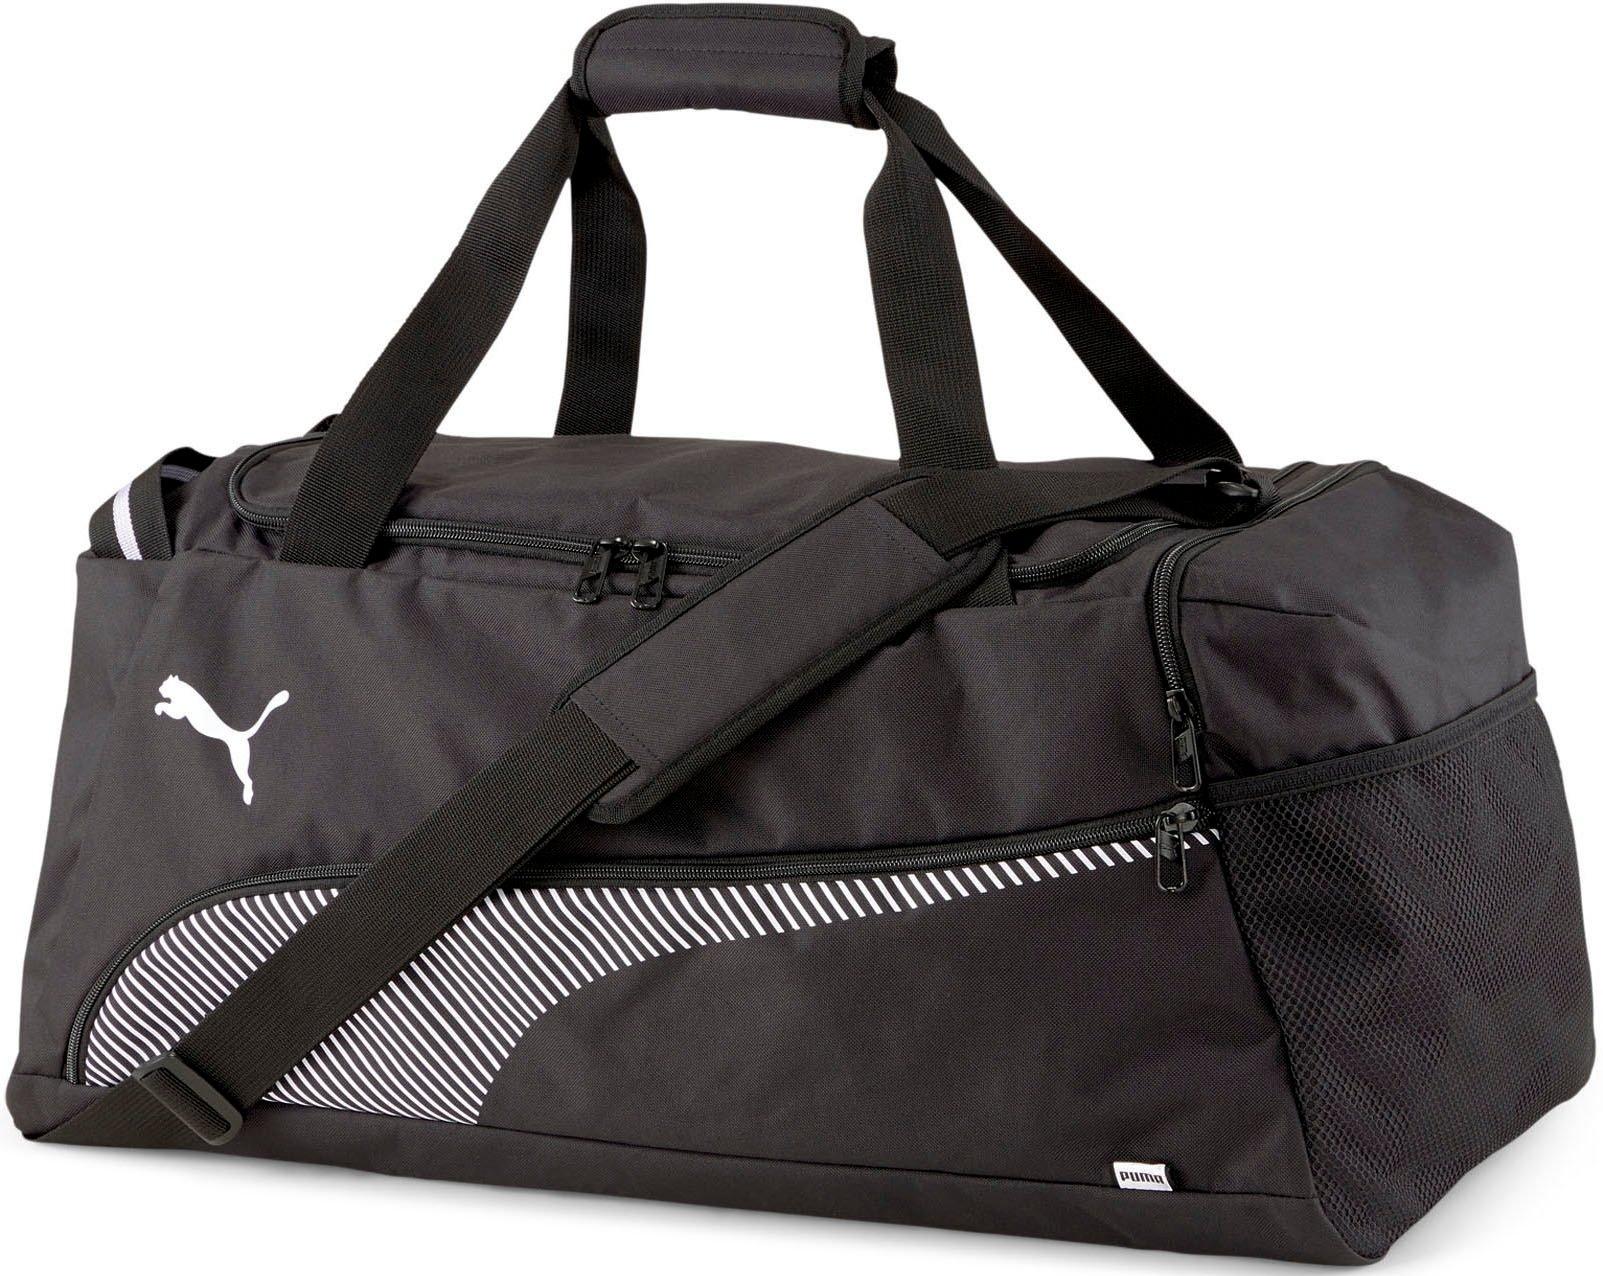 PUMA sporttas nu online kopen bij OTTO